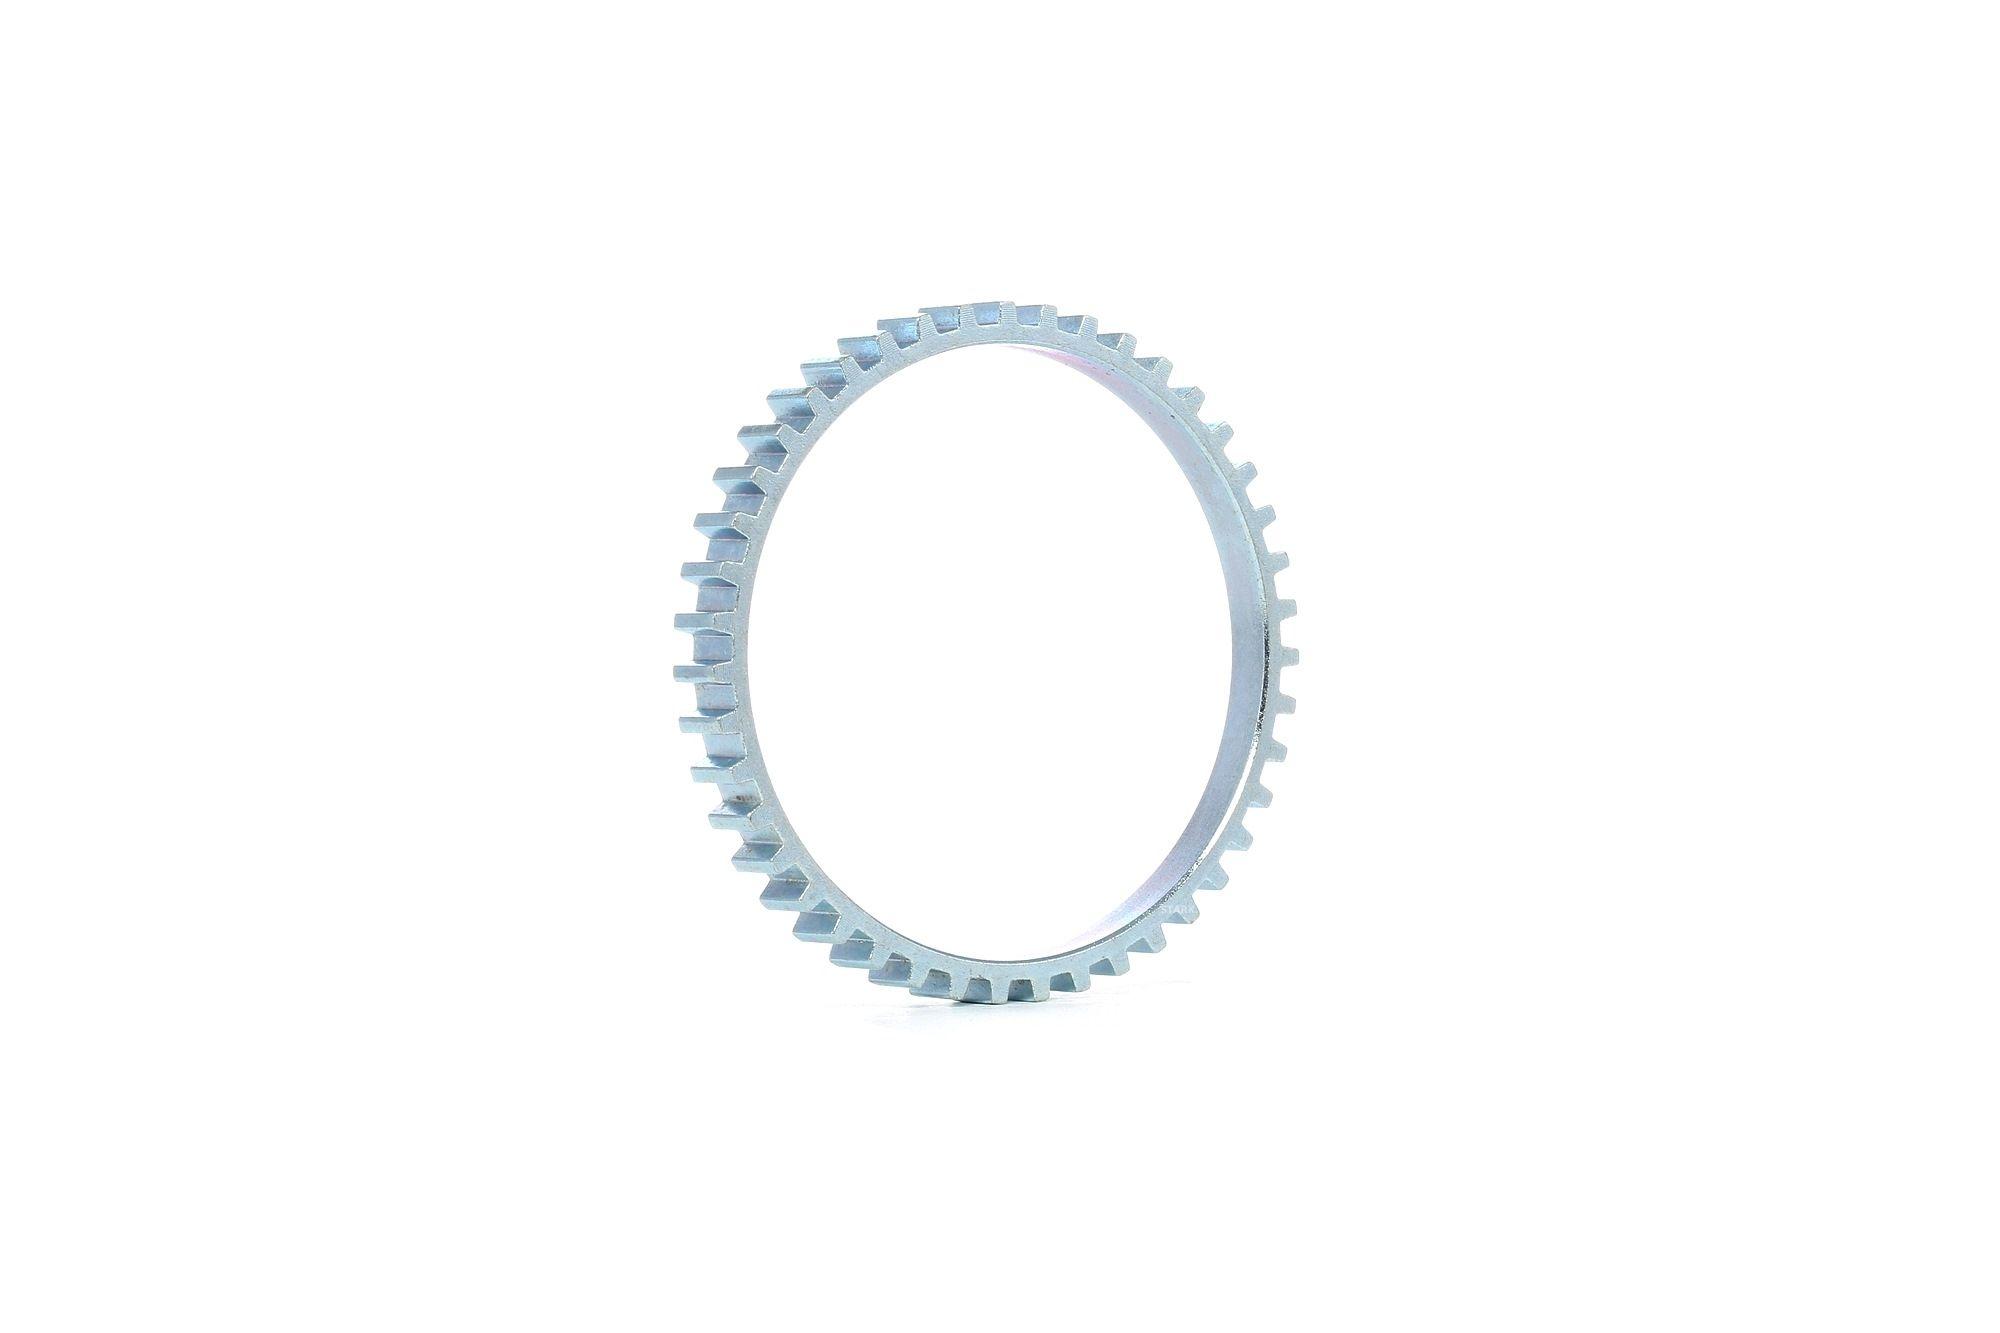 ABS Sensorring STARK SKSR-1410017 Bewertung